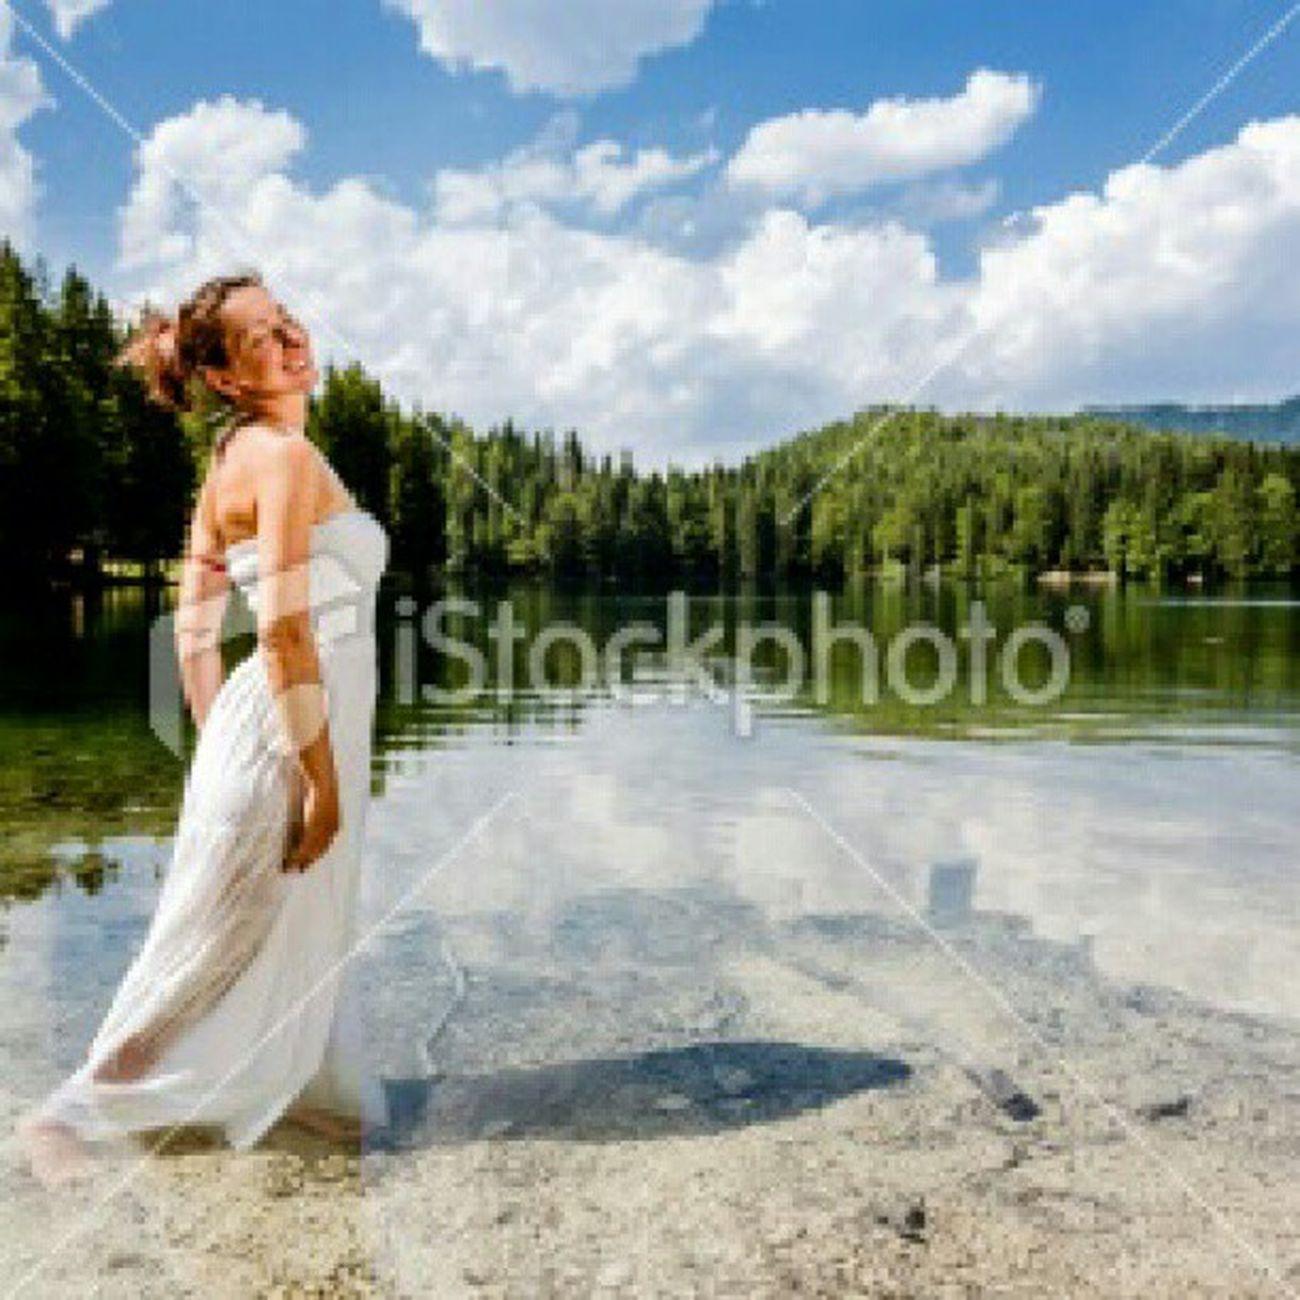 @mauro_grigollo Photographer model Istockphoto Istockers atworkphotography lake Austria italia Fusine Friuli Venezia Giulia lipse